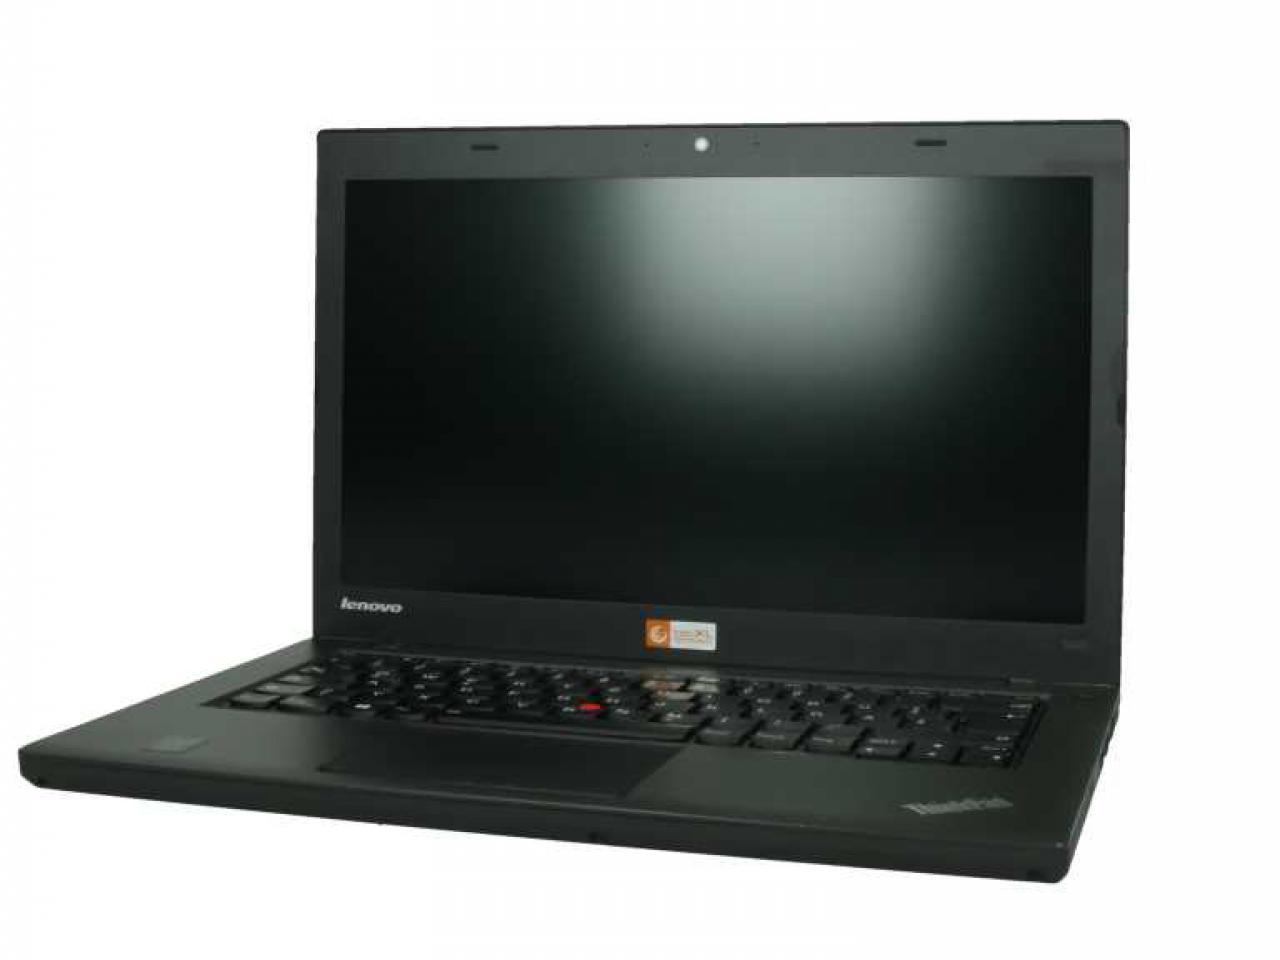 Lenovo ThinkPad T440 Touch  - shop.bb-net.de